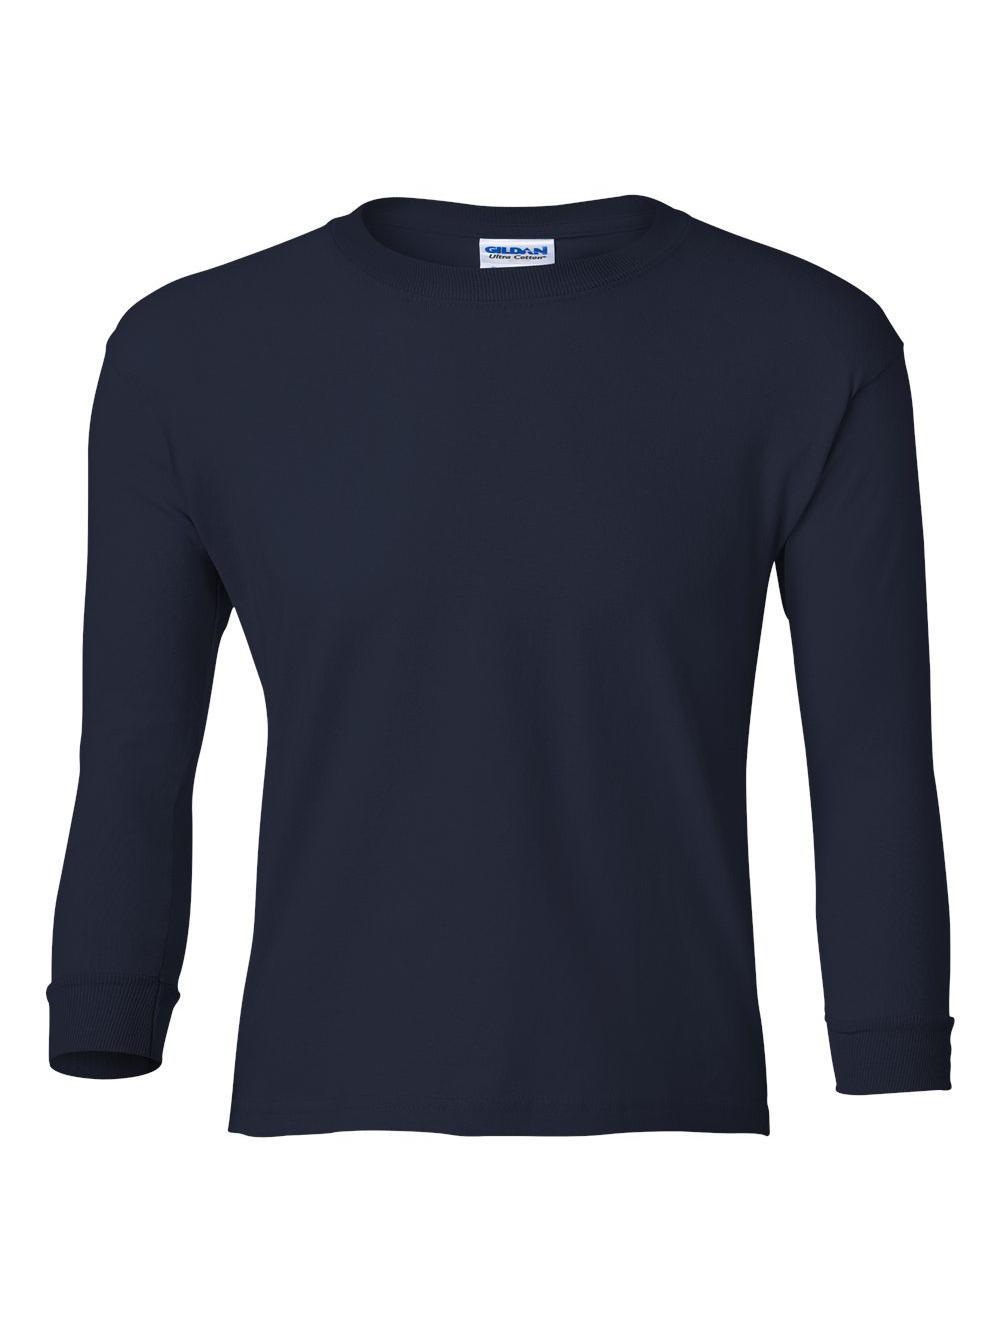 Gildan-Ultra-Cotton-Youth-Long-Sleeve-T-Shirt-2400B thumbnail 24